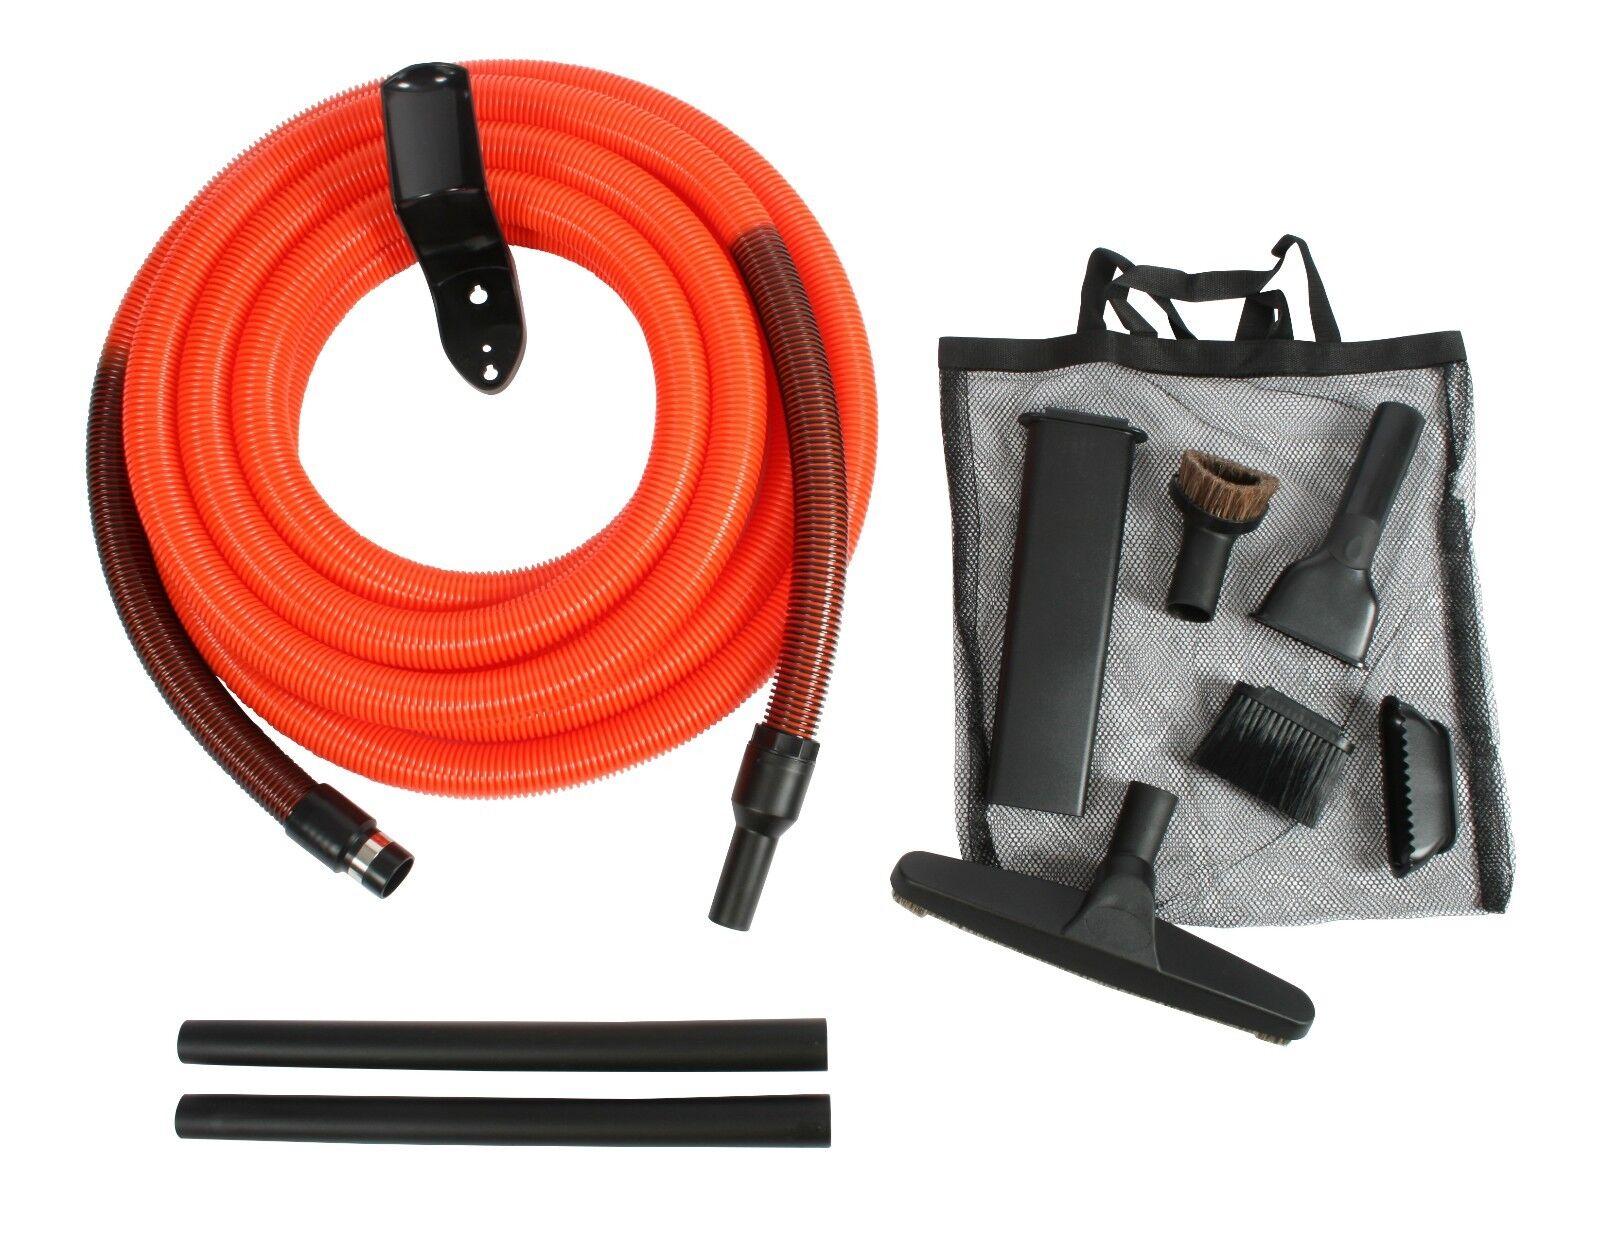 Cen-Tec Systems 93730 Central Vacuum Garage Attachment Kit